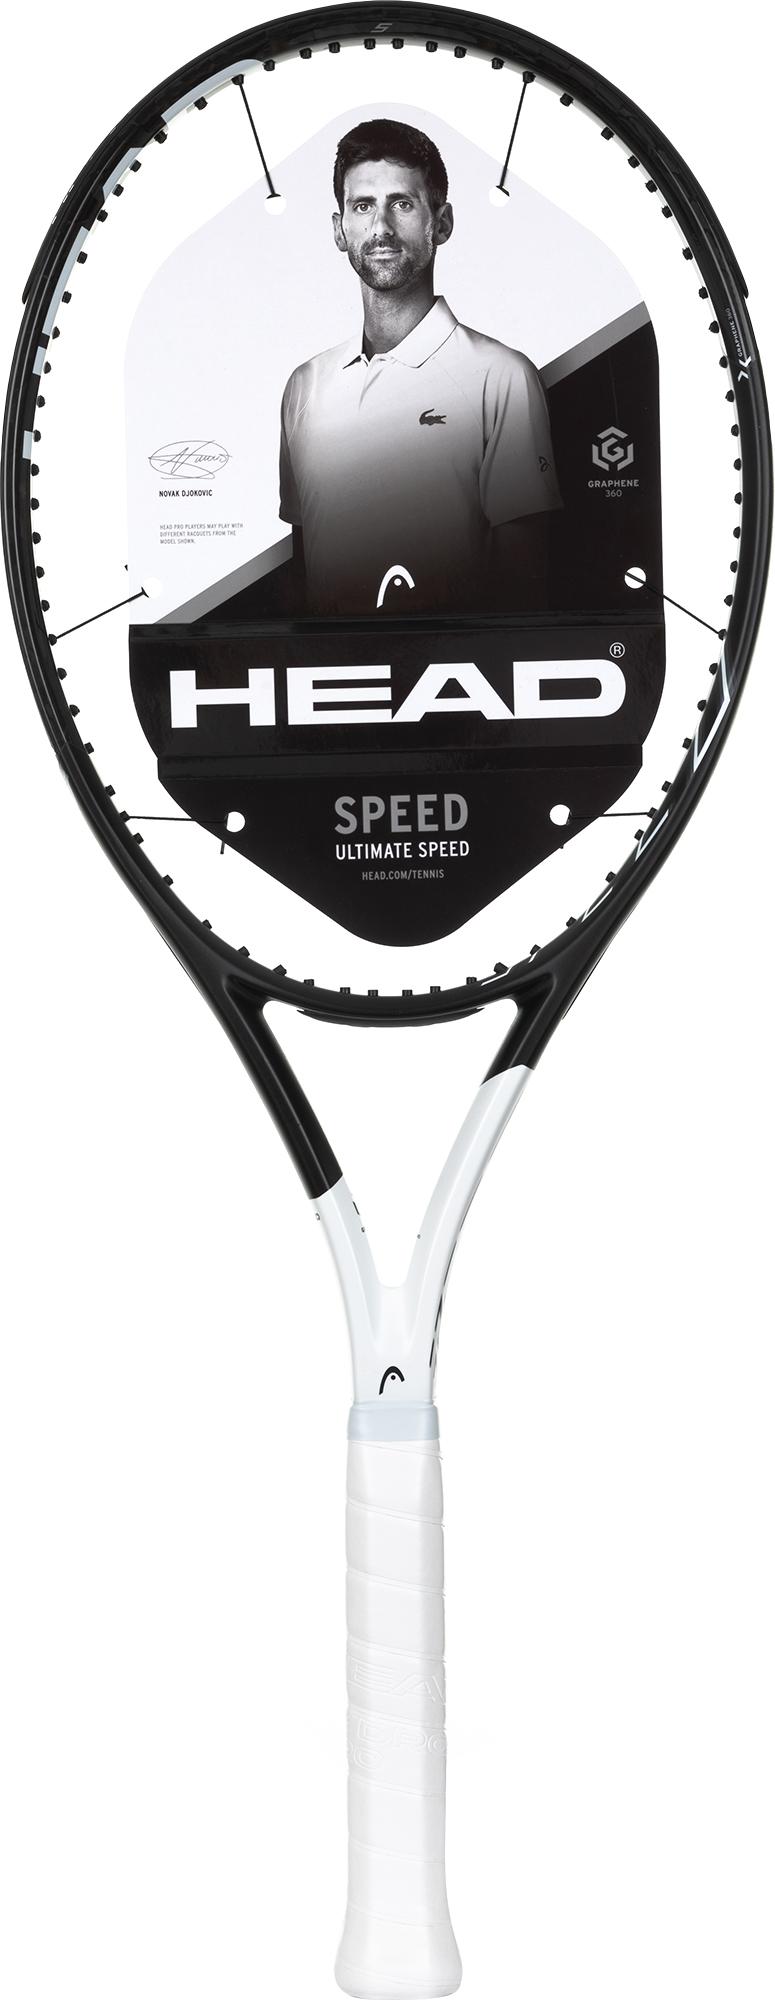 Head Ракетка для большого тенниса Head Graphene 360 Speed S, размер 3 head ракетка для большого тенниса детская head novak 25 размер без размера